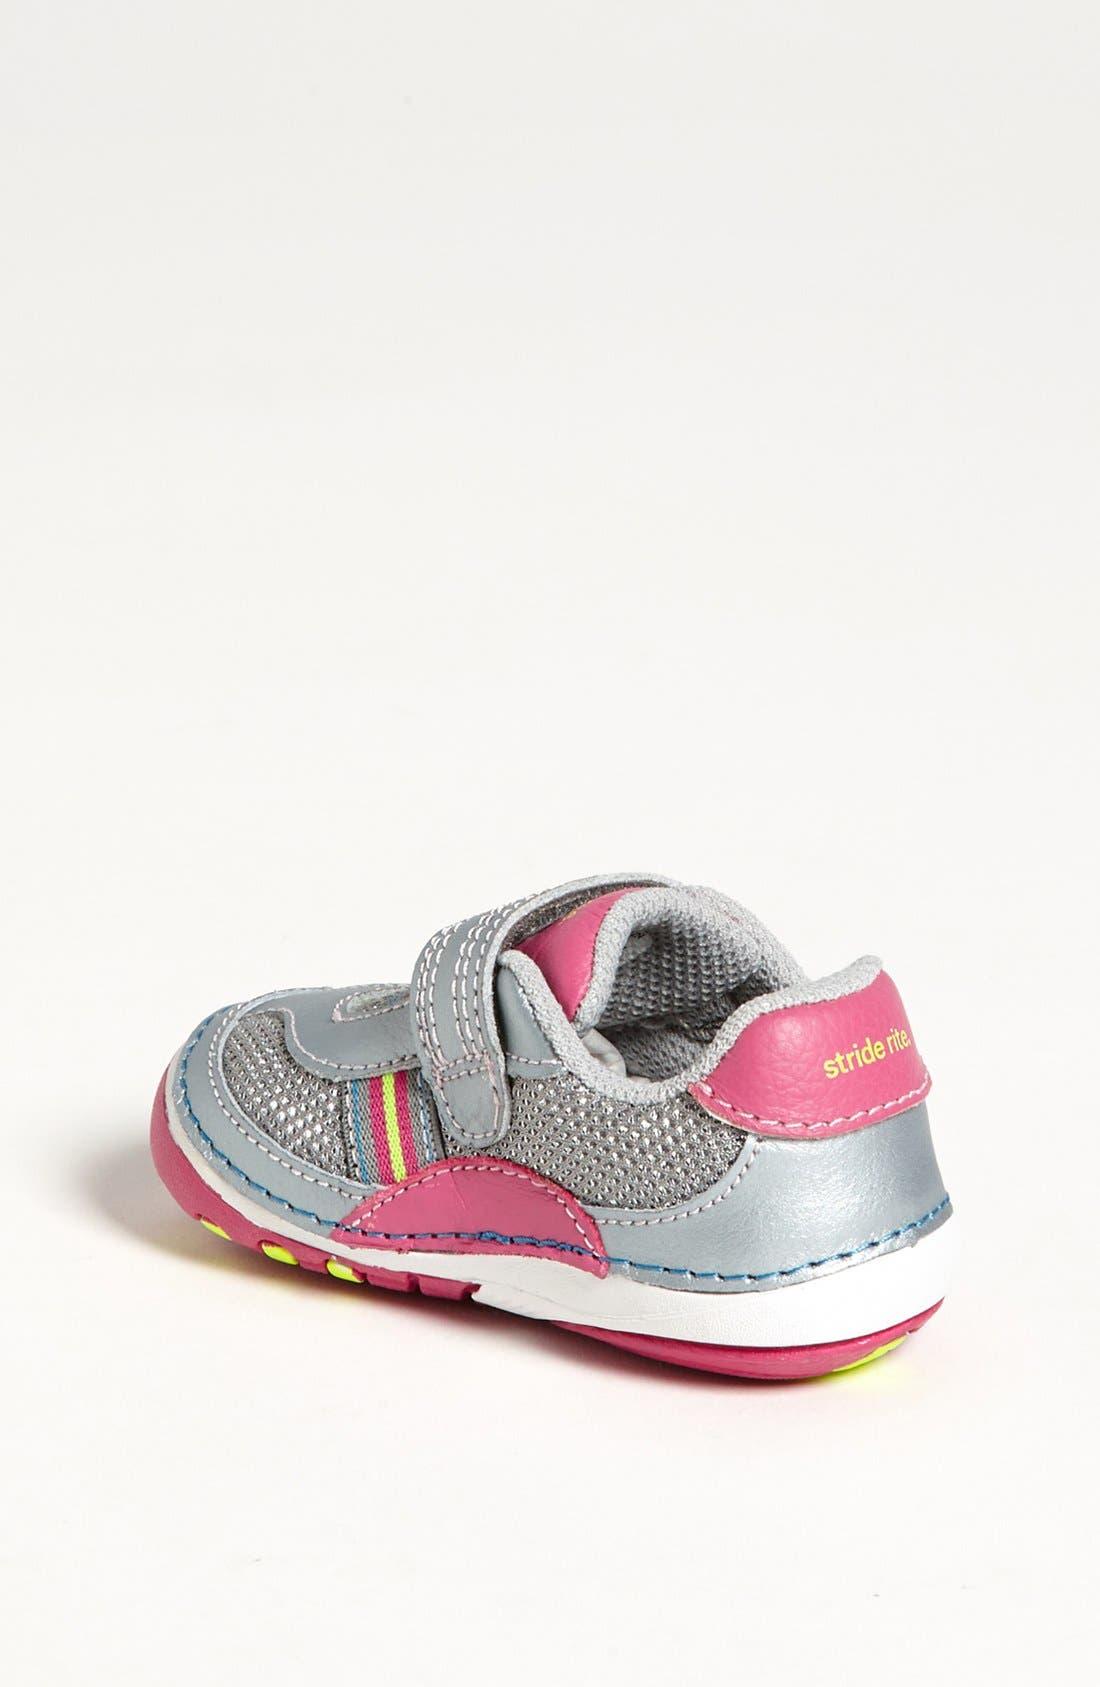 Alternate Image 2  - Stride Rite 'Aldrin' Sneaker (Baby & Walker)